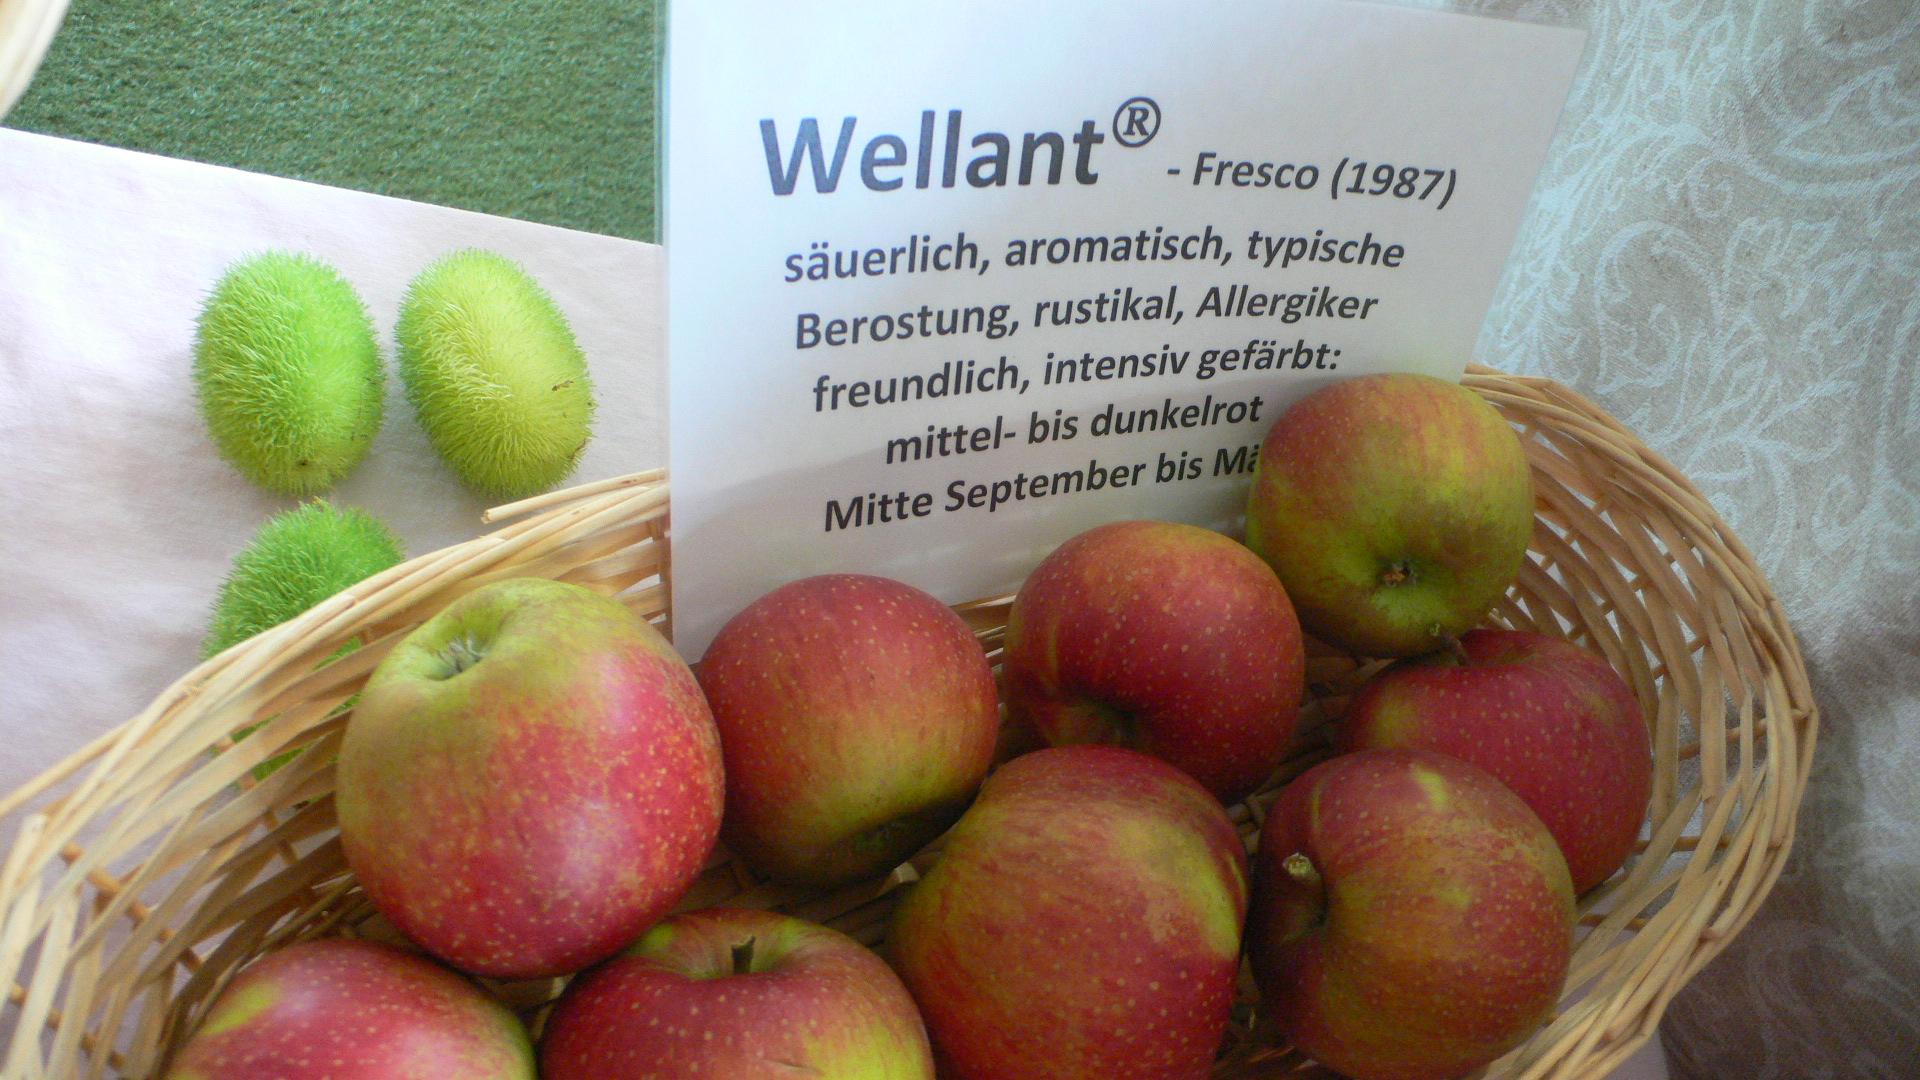 Apfelsorte Wellant